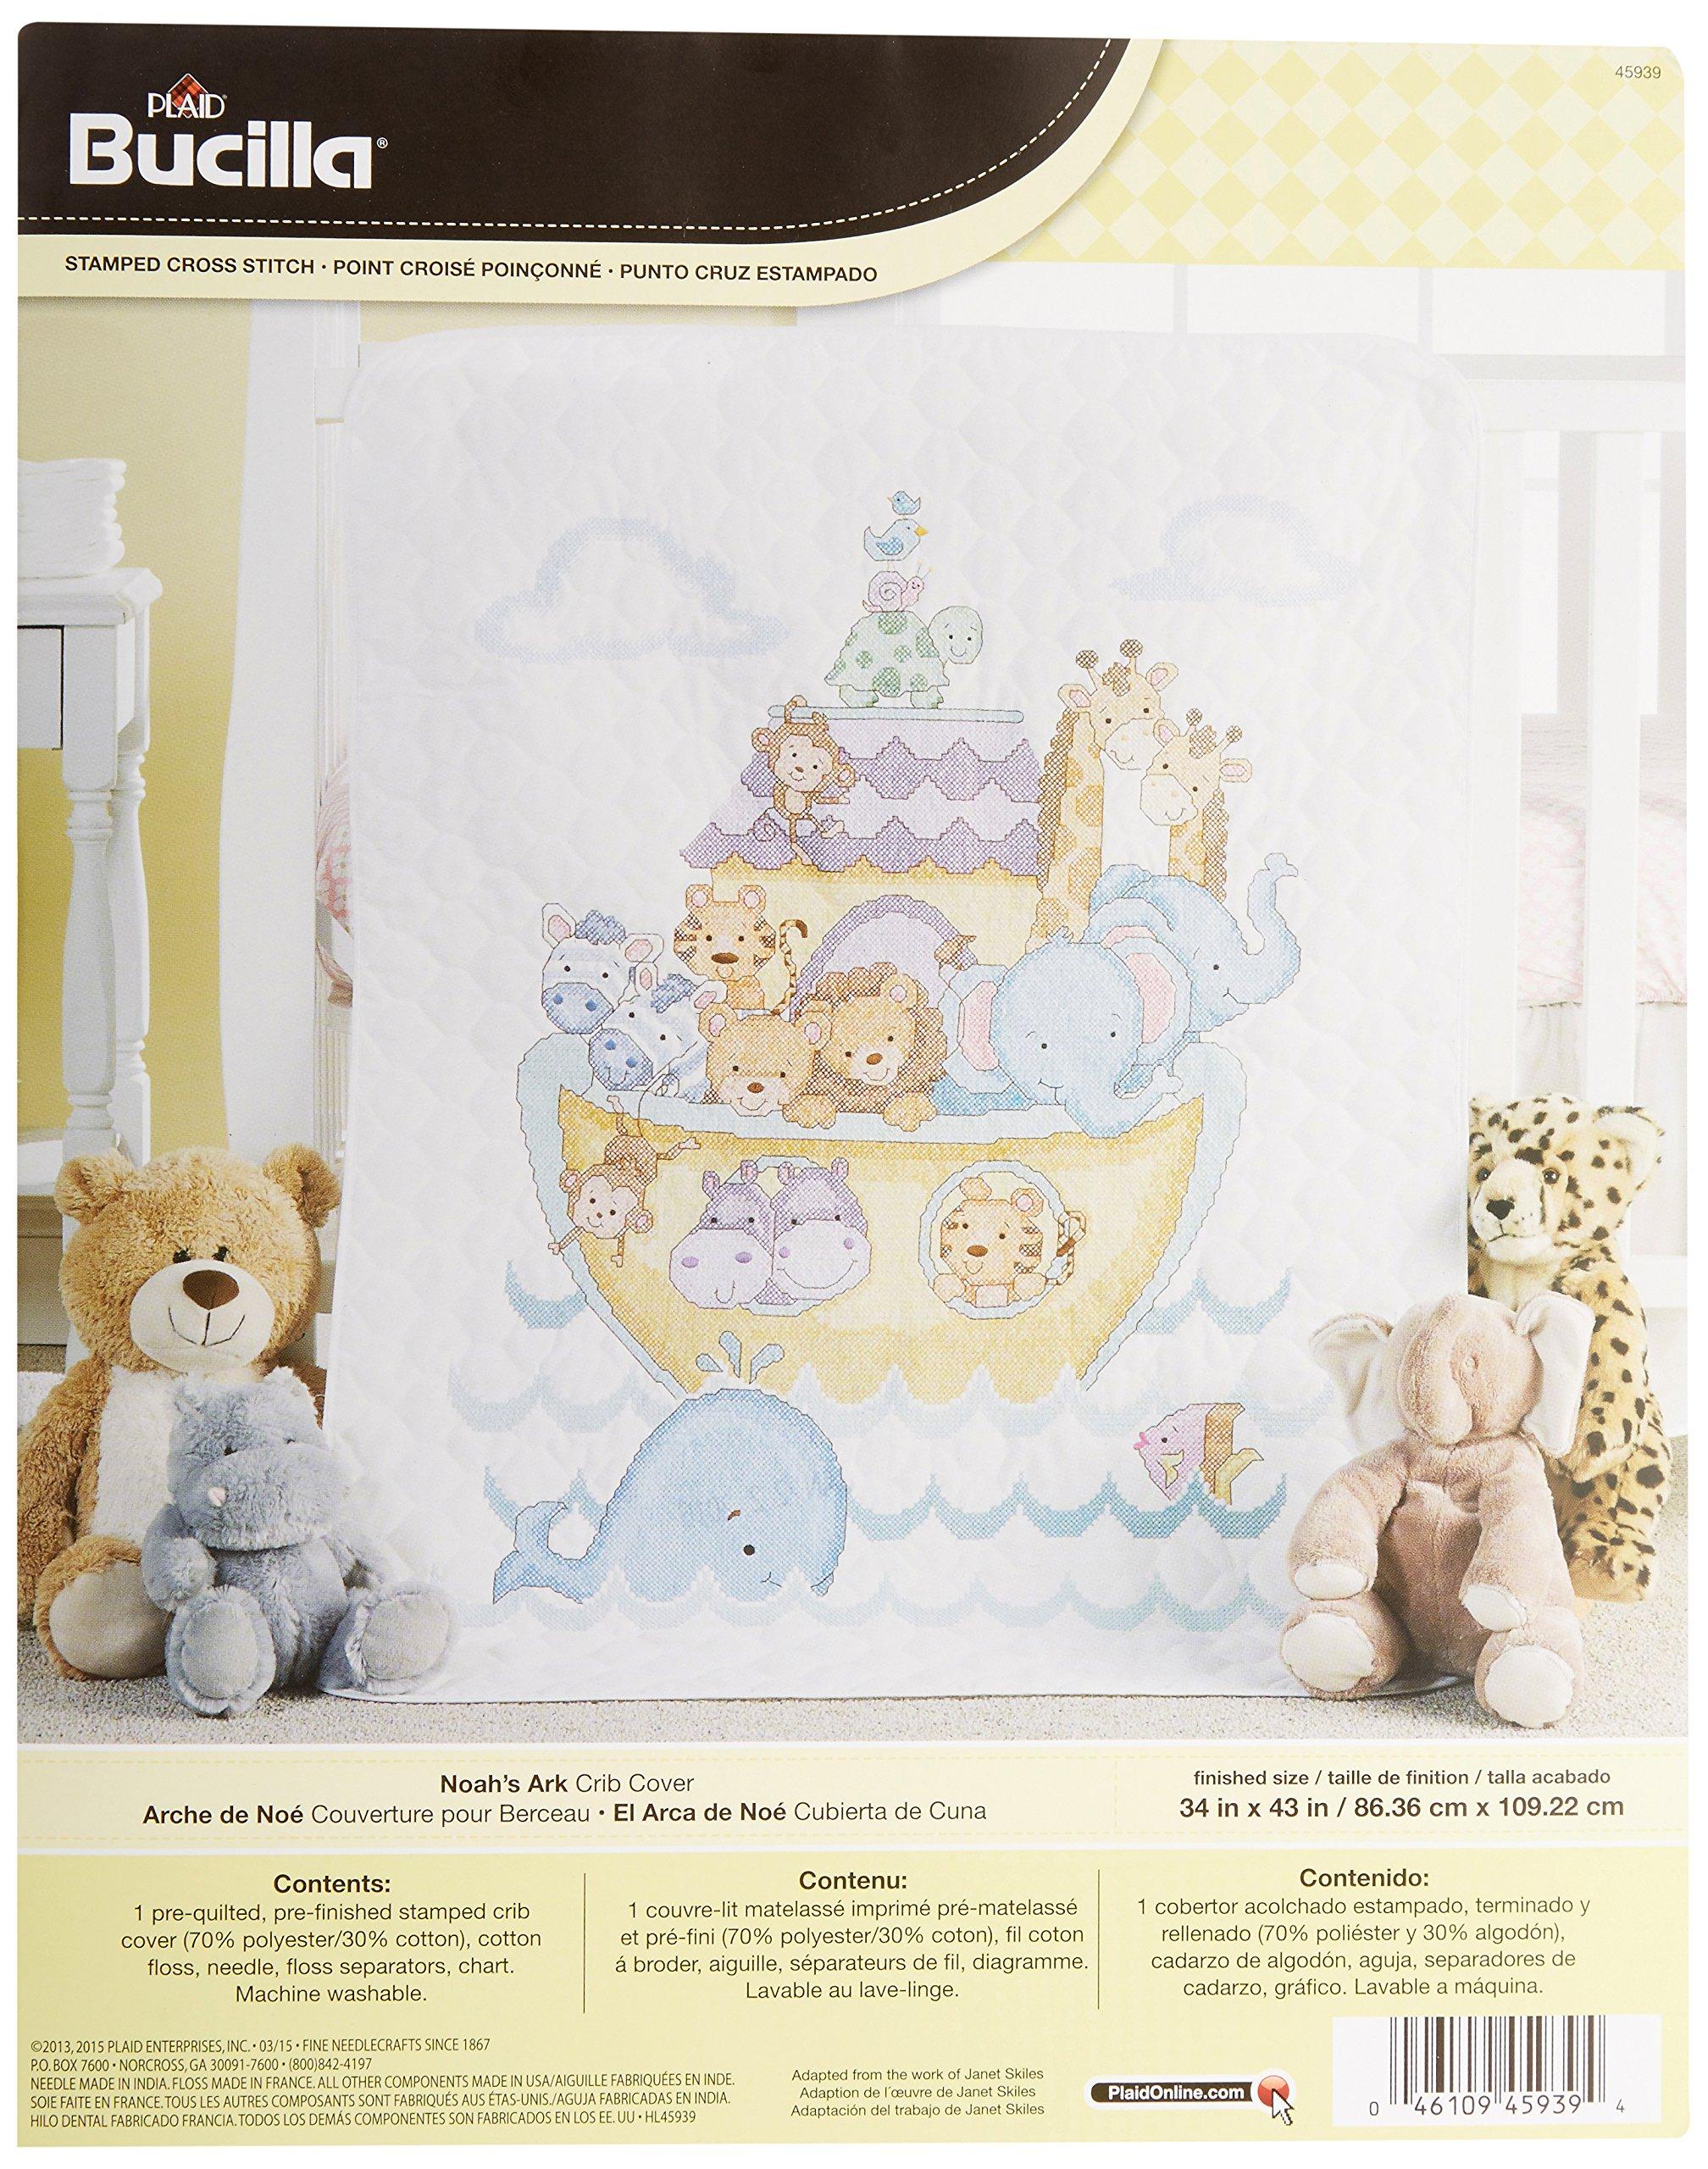 Bucilla Stamped Cross Stitch Crib Cover Kit, 34 by 43-Inch, 45939  Noah's Ark by Bucilla